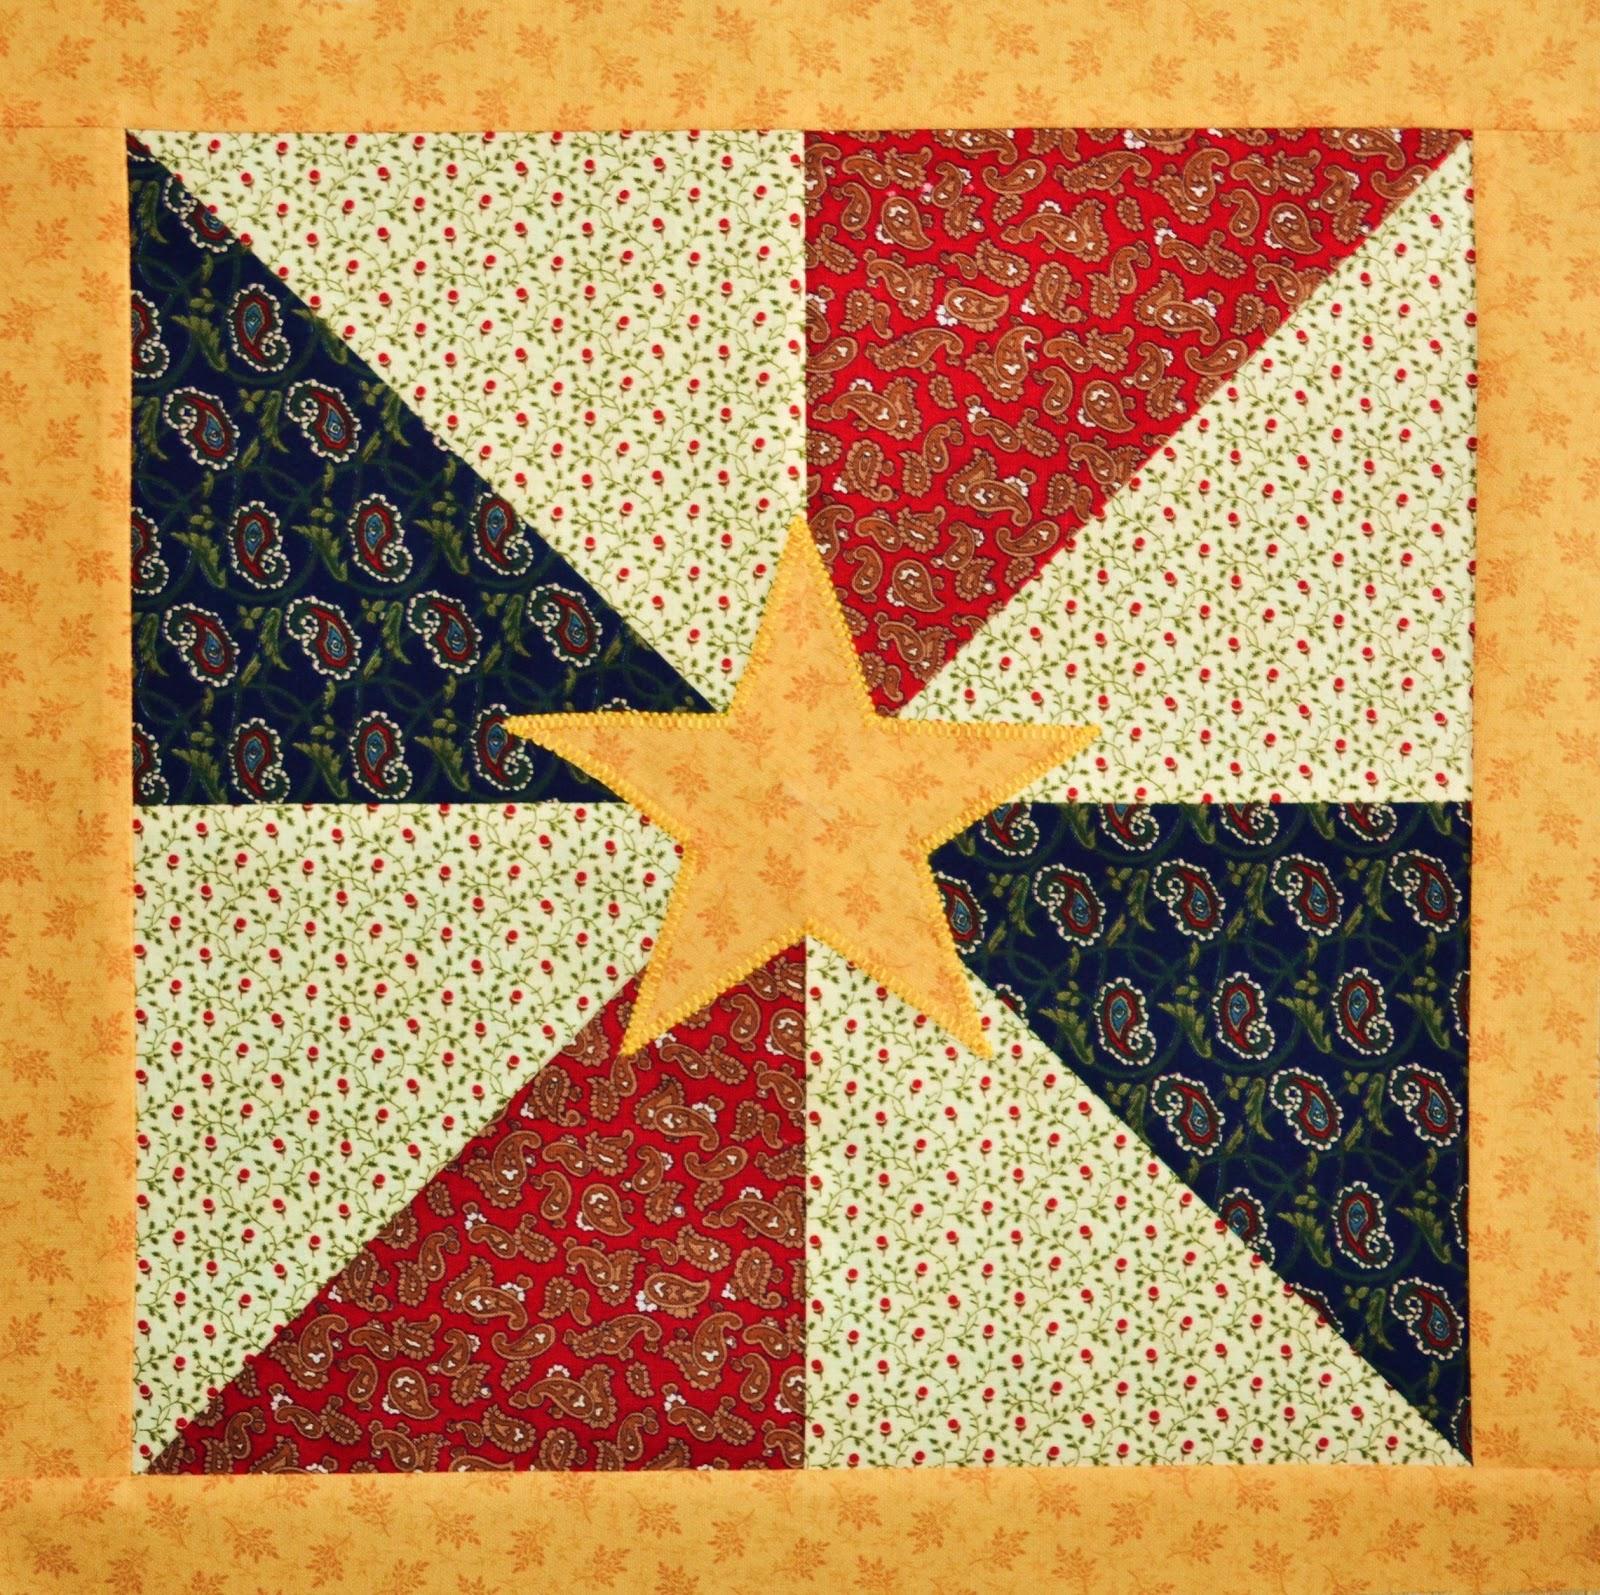 Chock-A-Block Quilt Blocks: Shouting Yankee Doodle